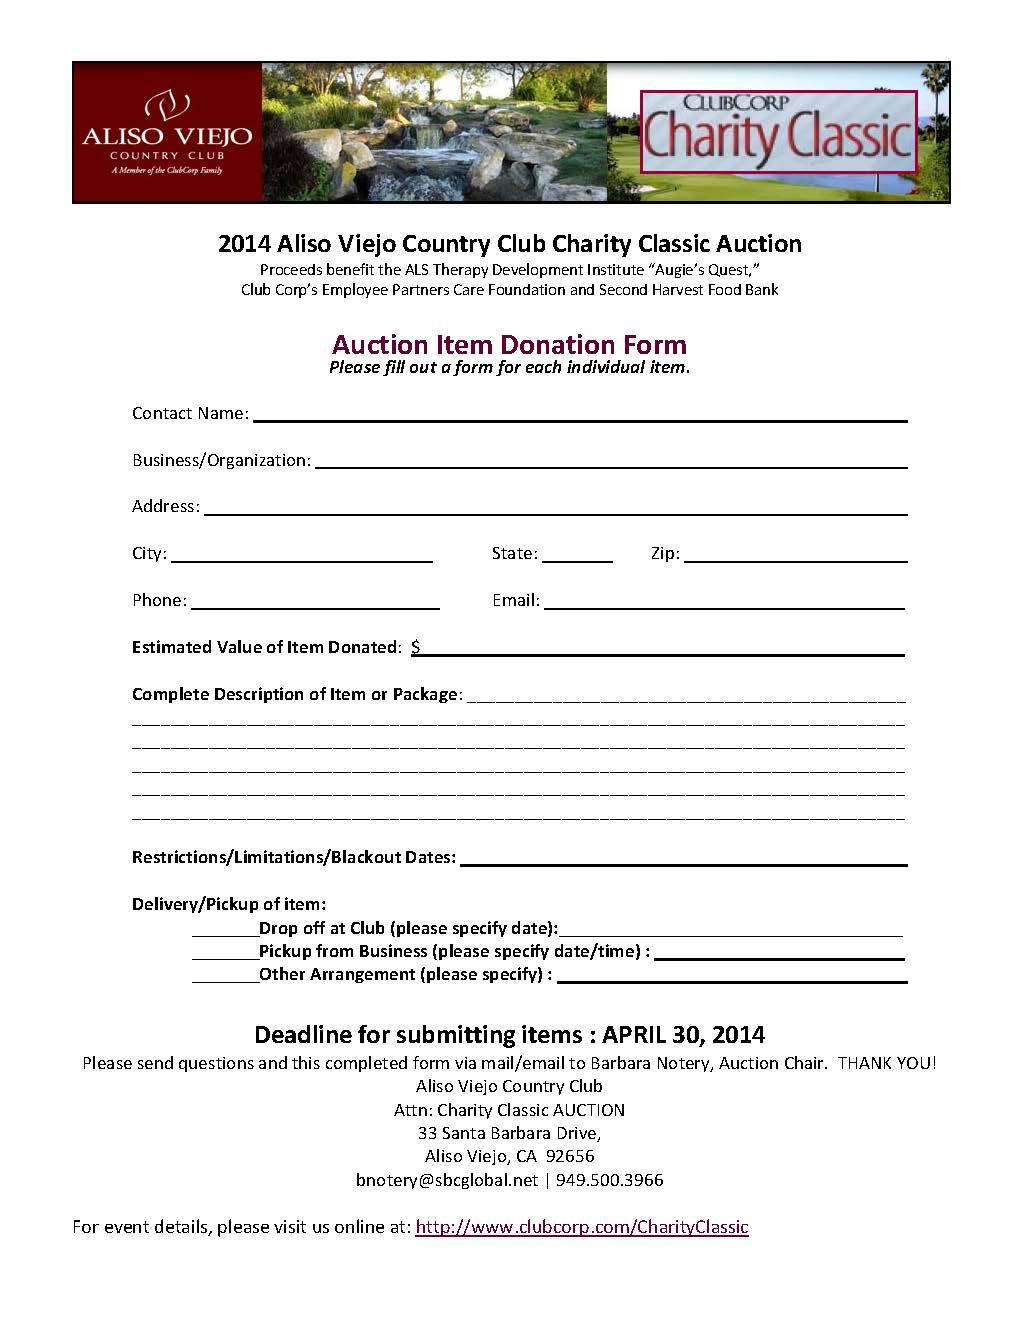 Auction Item Donation Form 14.jpg